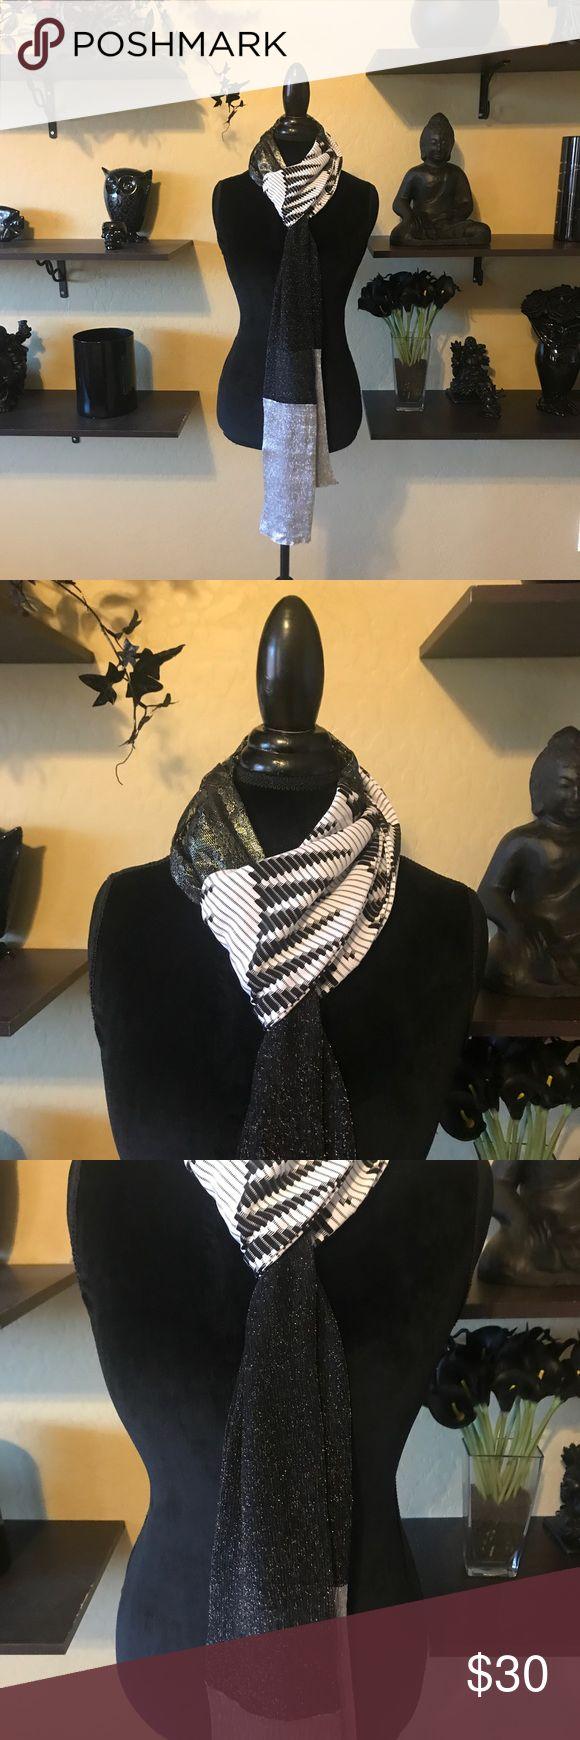 Selling this Fromcandiewithlove on Poshmark! My username is: jcaaajones. #shopmycloset #poshmark #fashion #shopping #style #forsale #fromcandiewithlove #Accessories